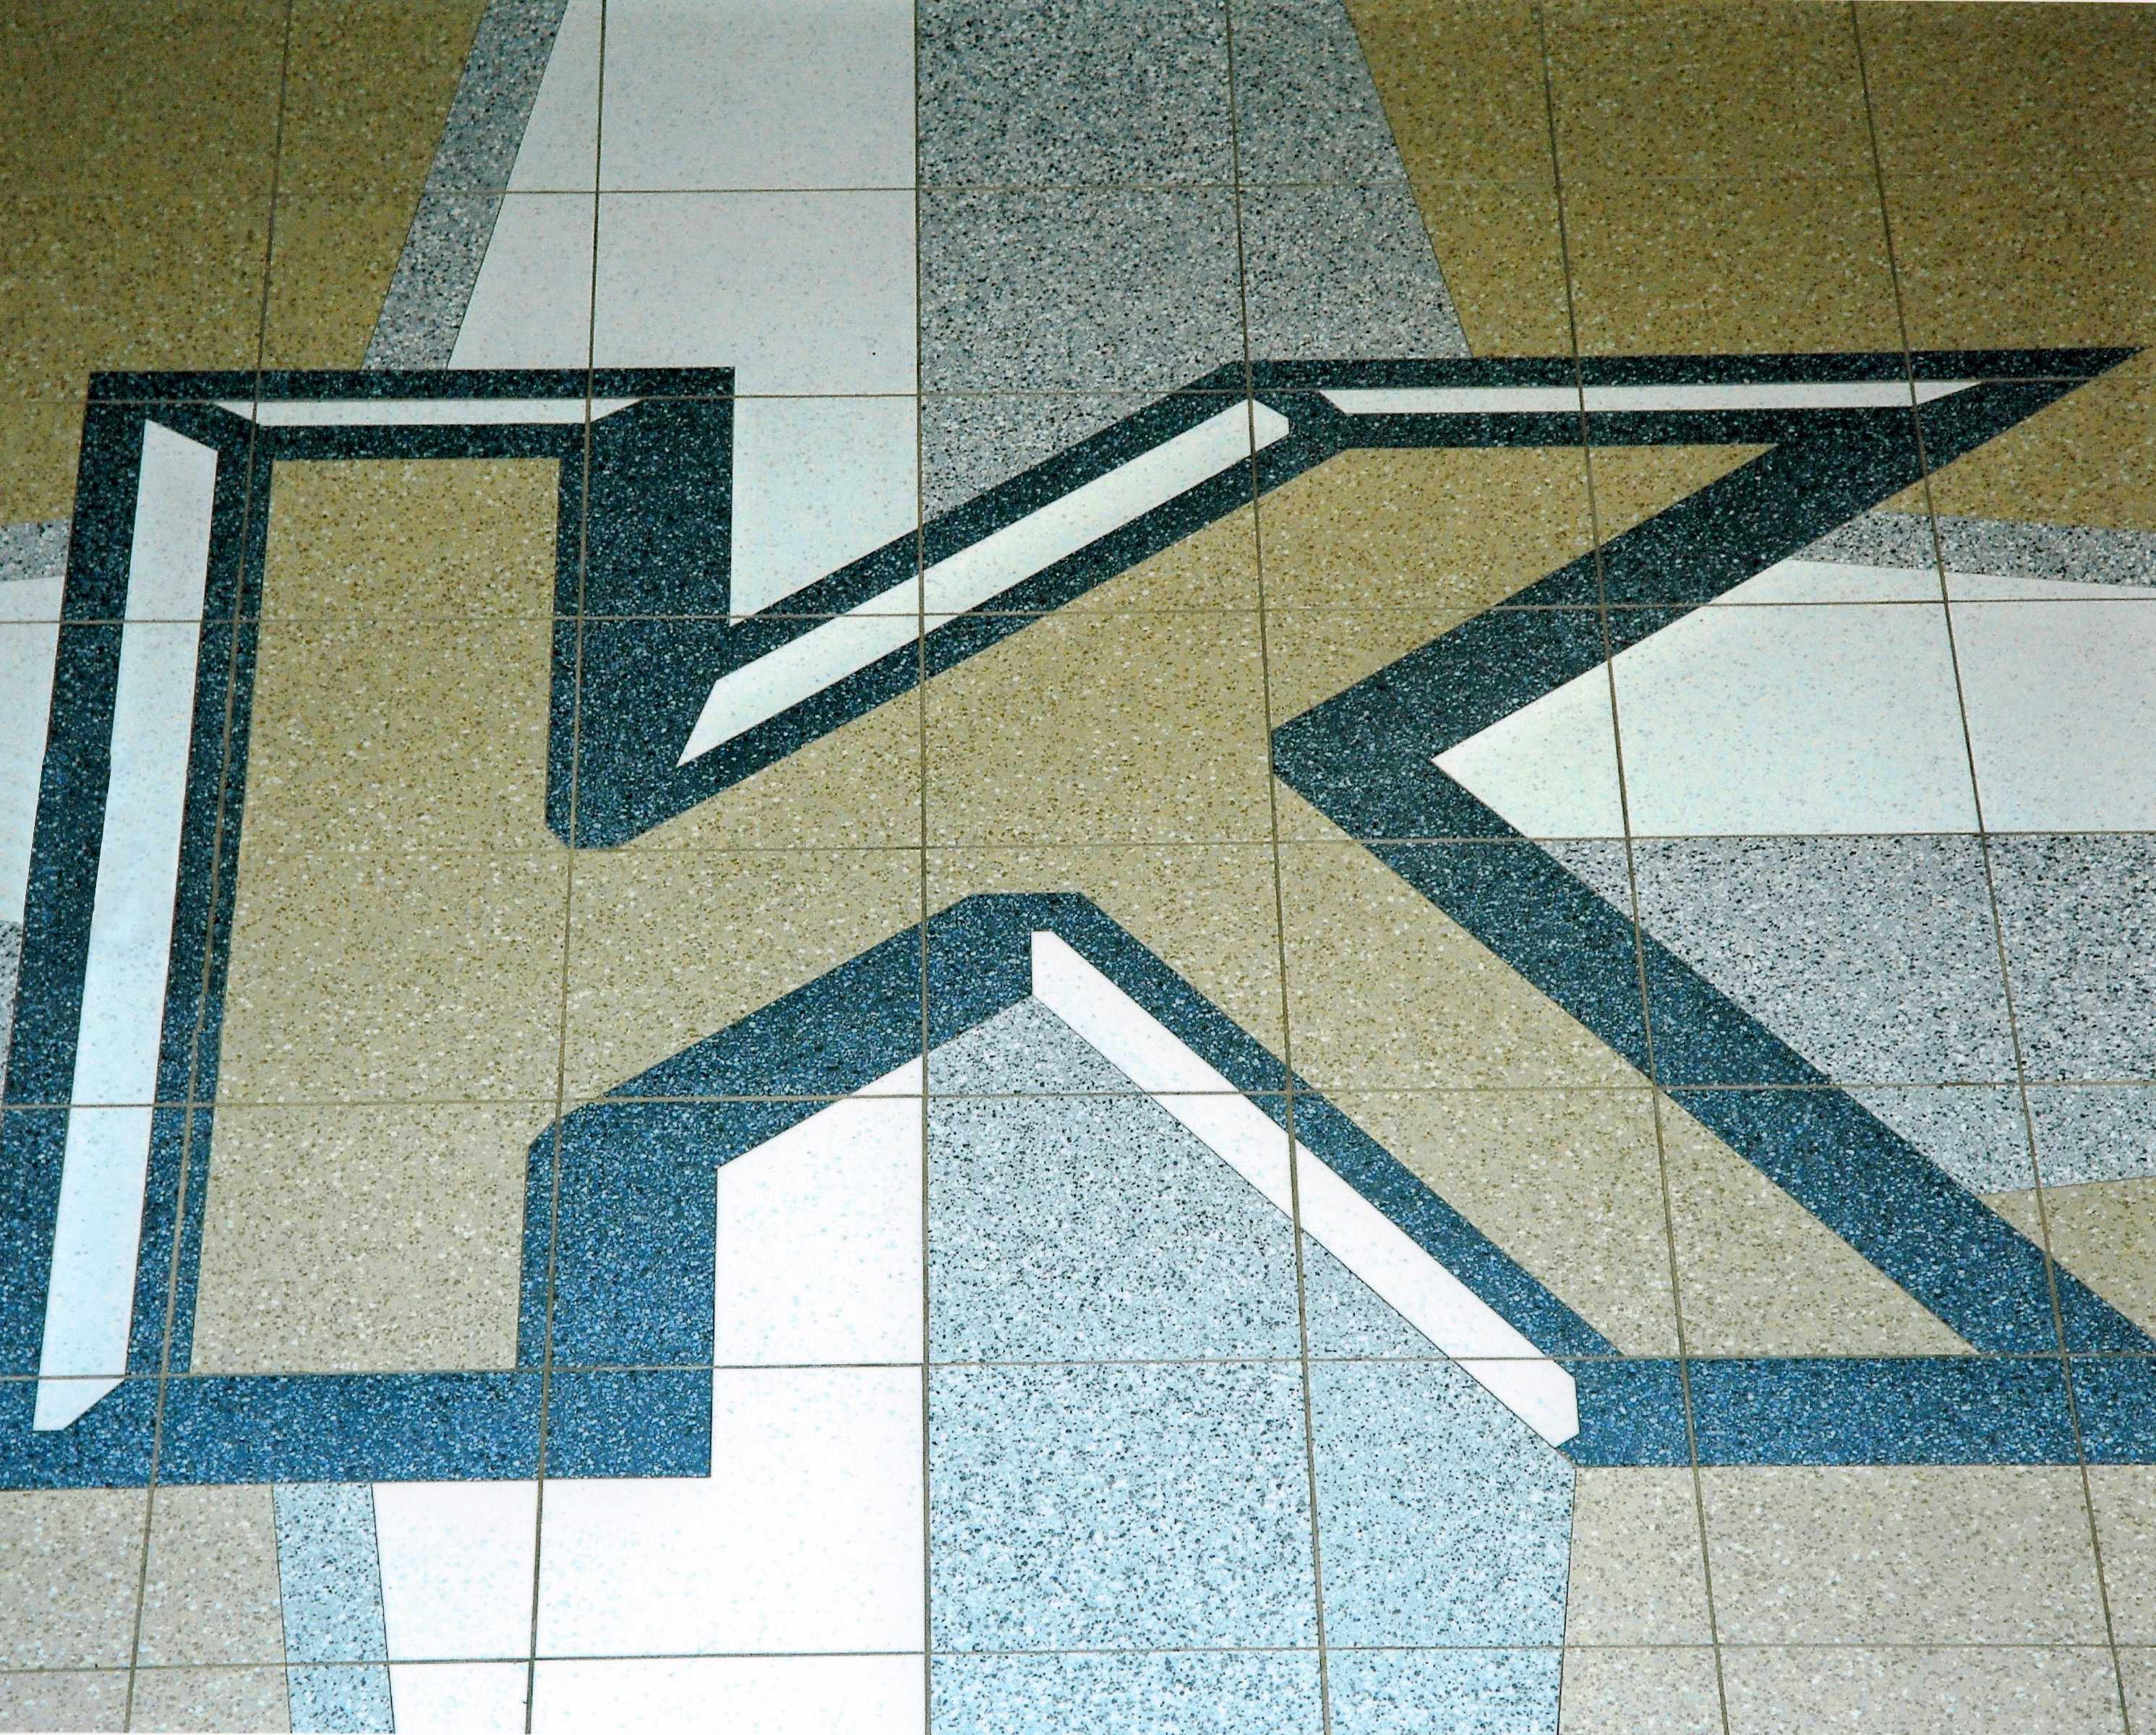 Kiski Area High School Ceramic Tile International Masonry Institute